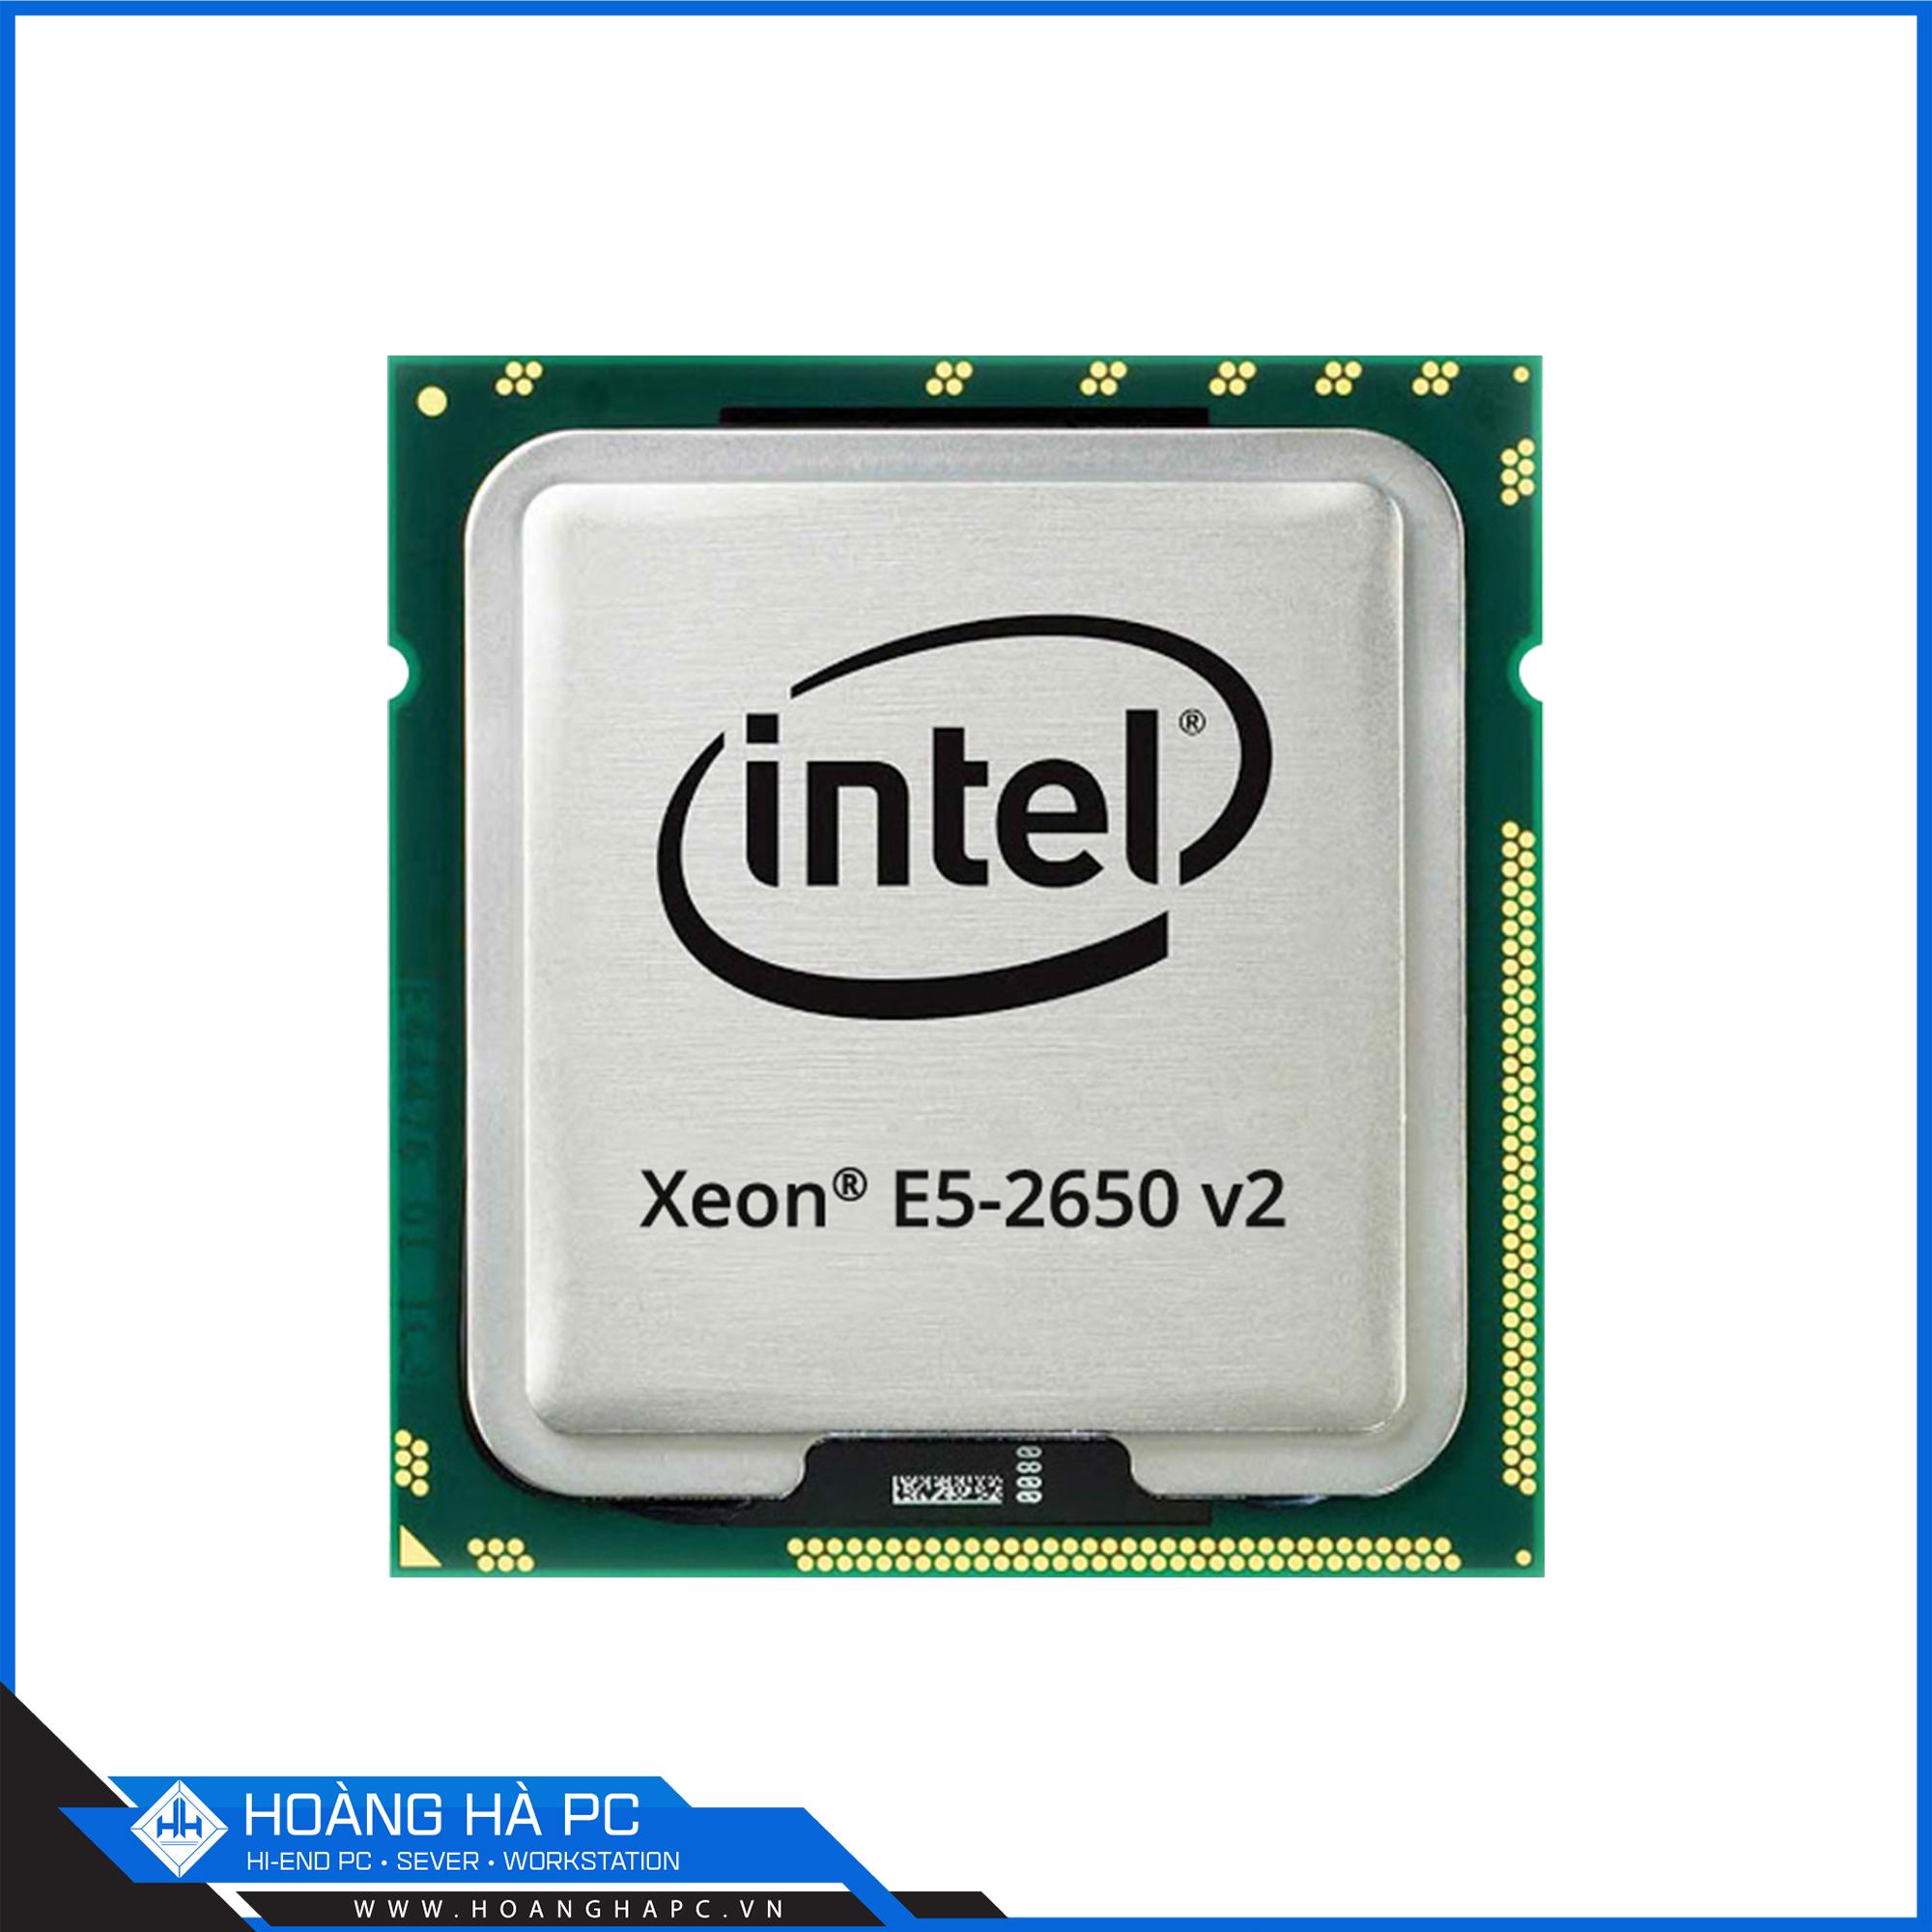 Intel Xeon E5-2650v2